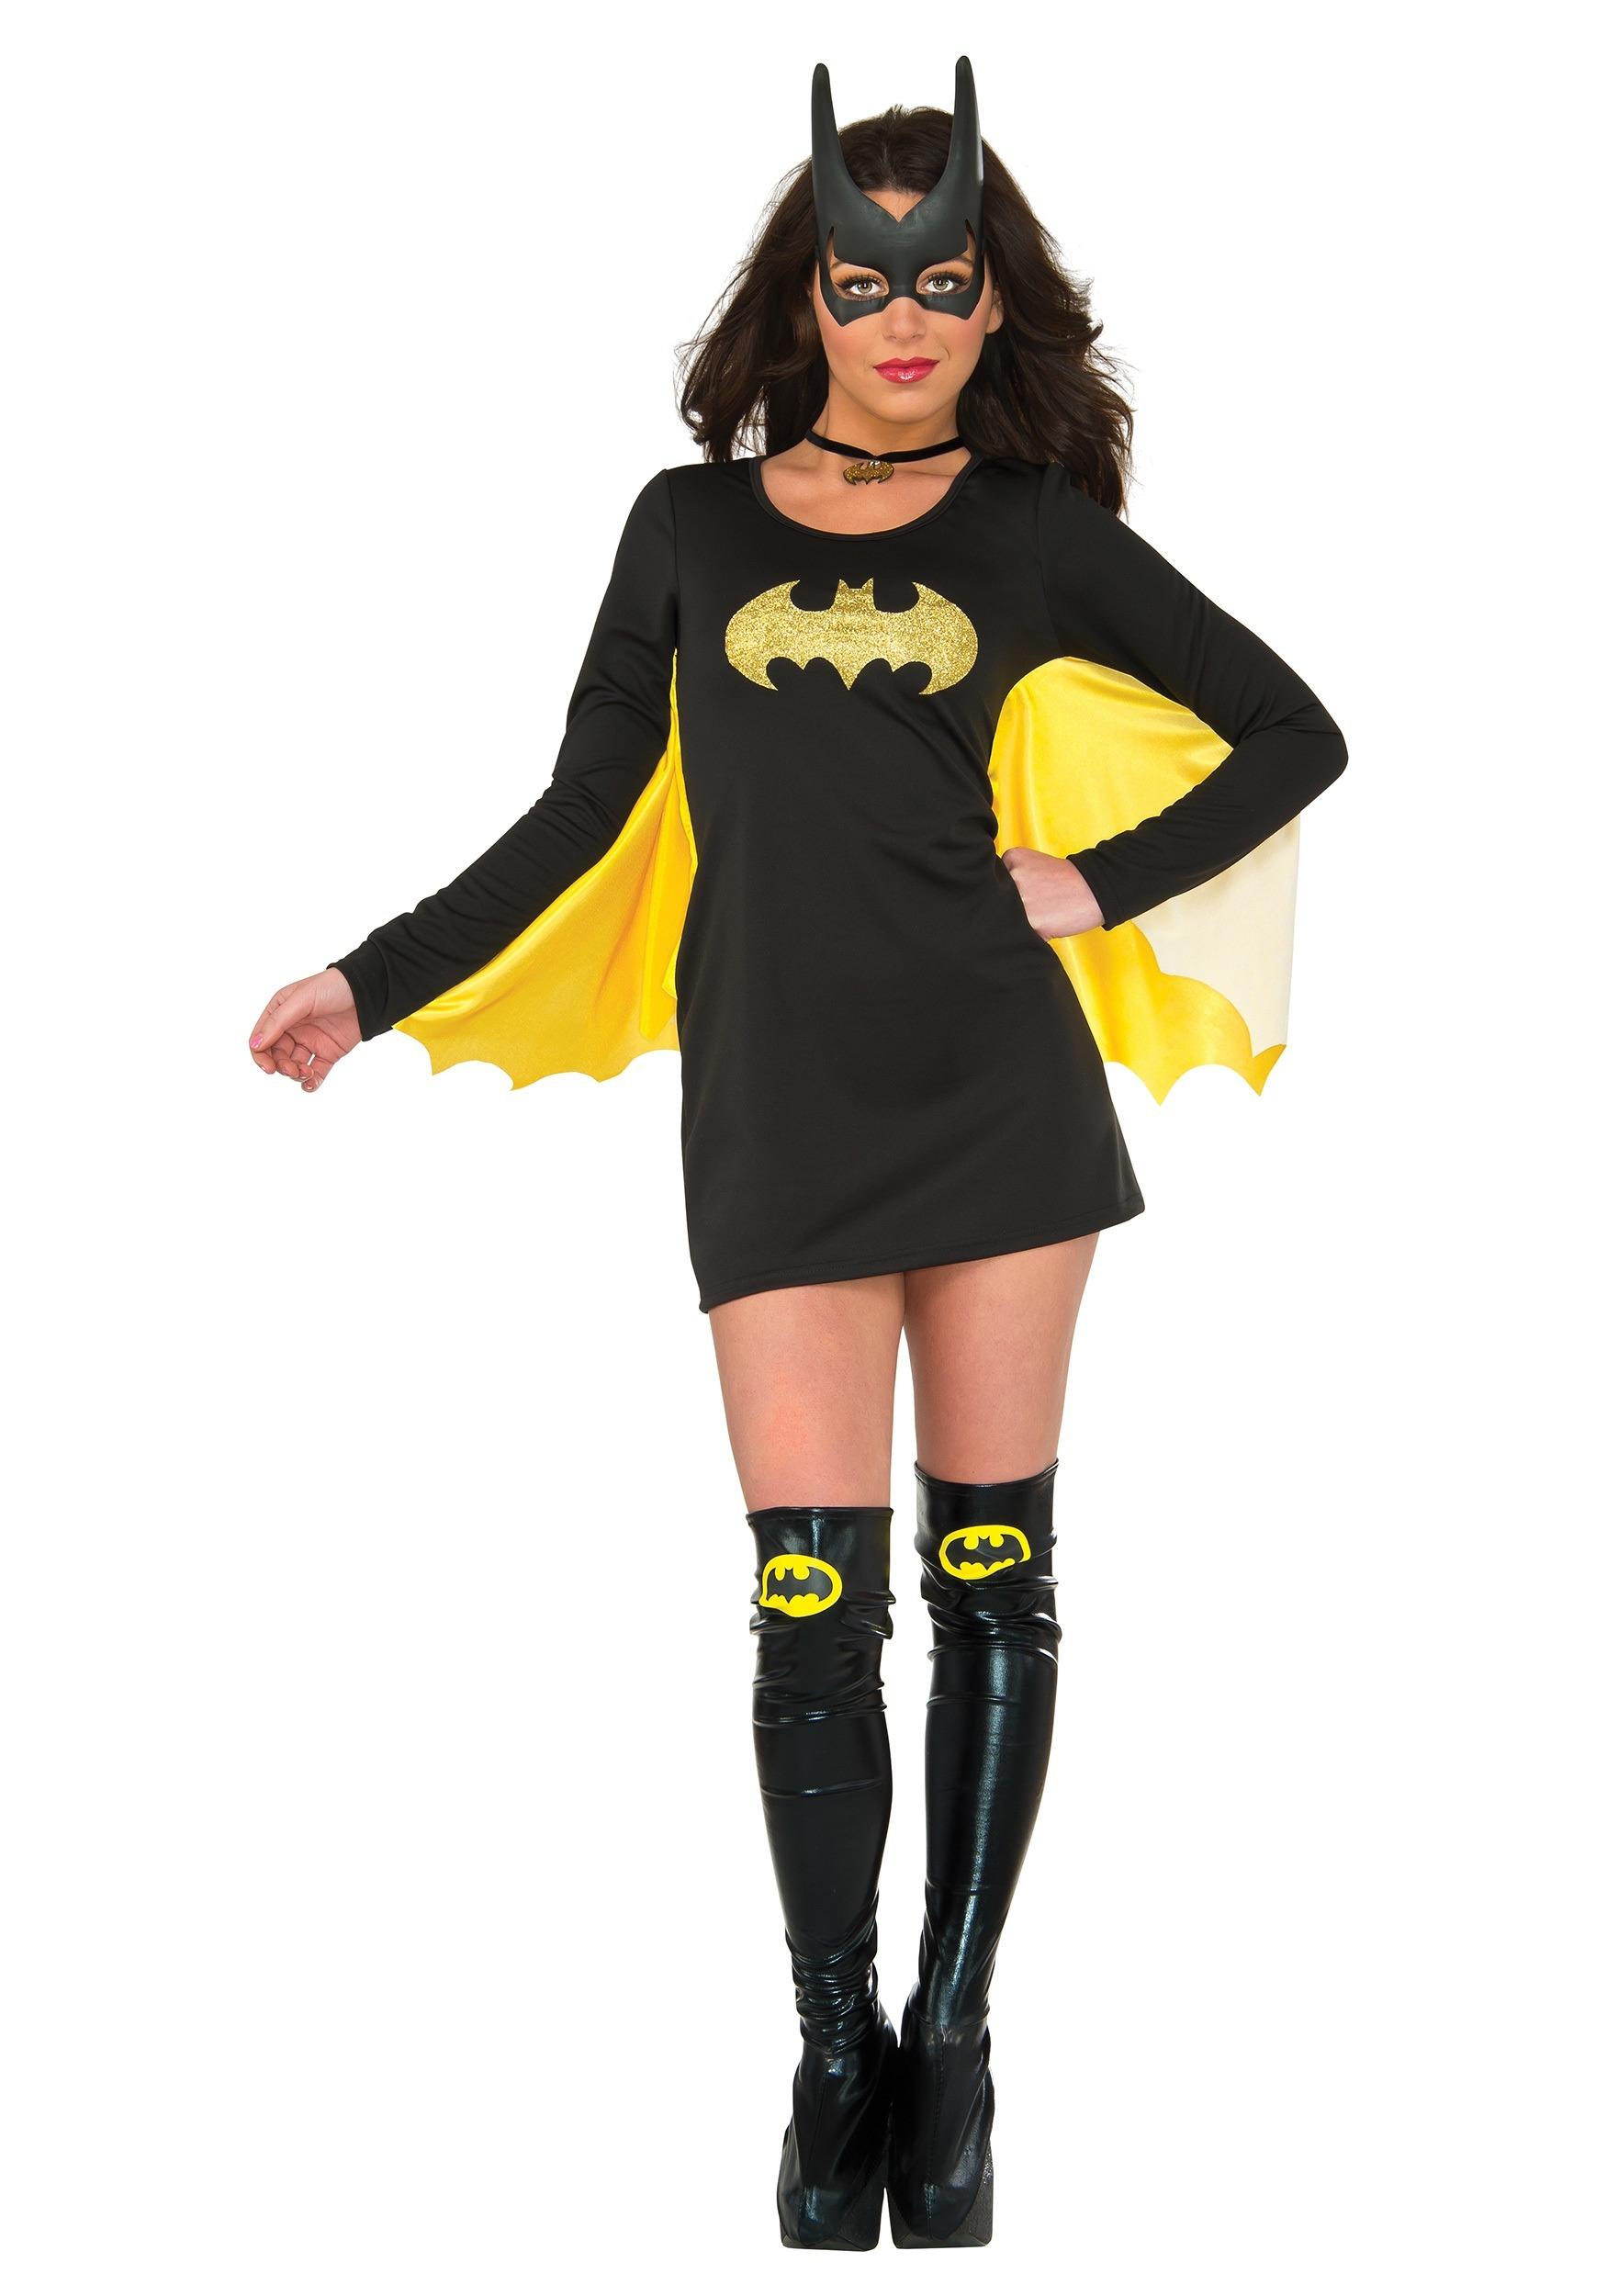 DC Batgirl Women's Wing Dress CostumeBatgirl Costumes